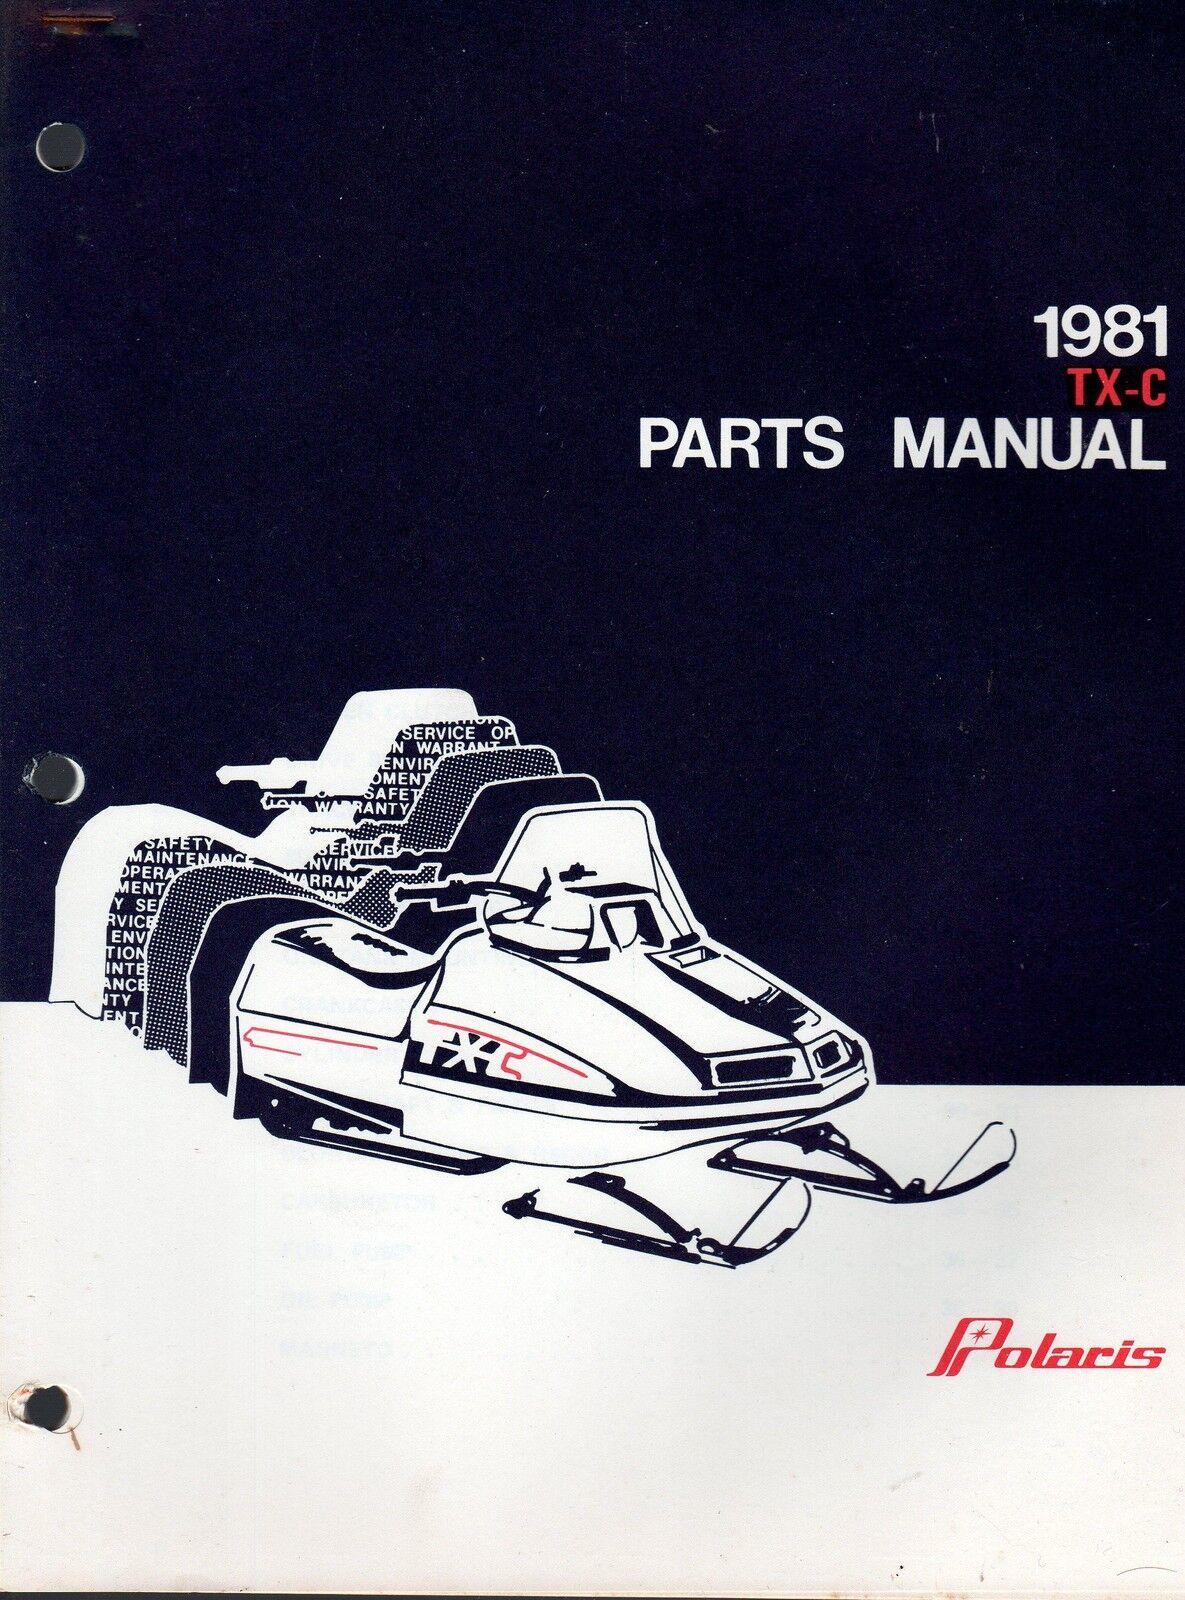 1981 POLARIS TX-C SNOWMOBILE OWNERS MANUAL